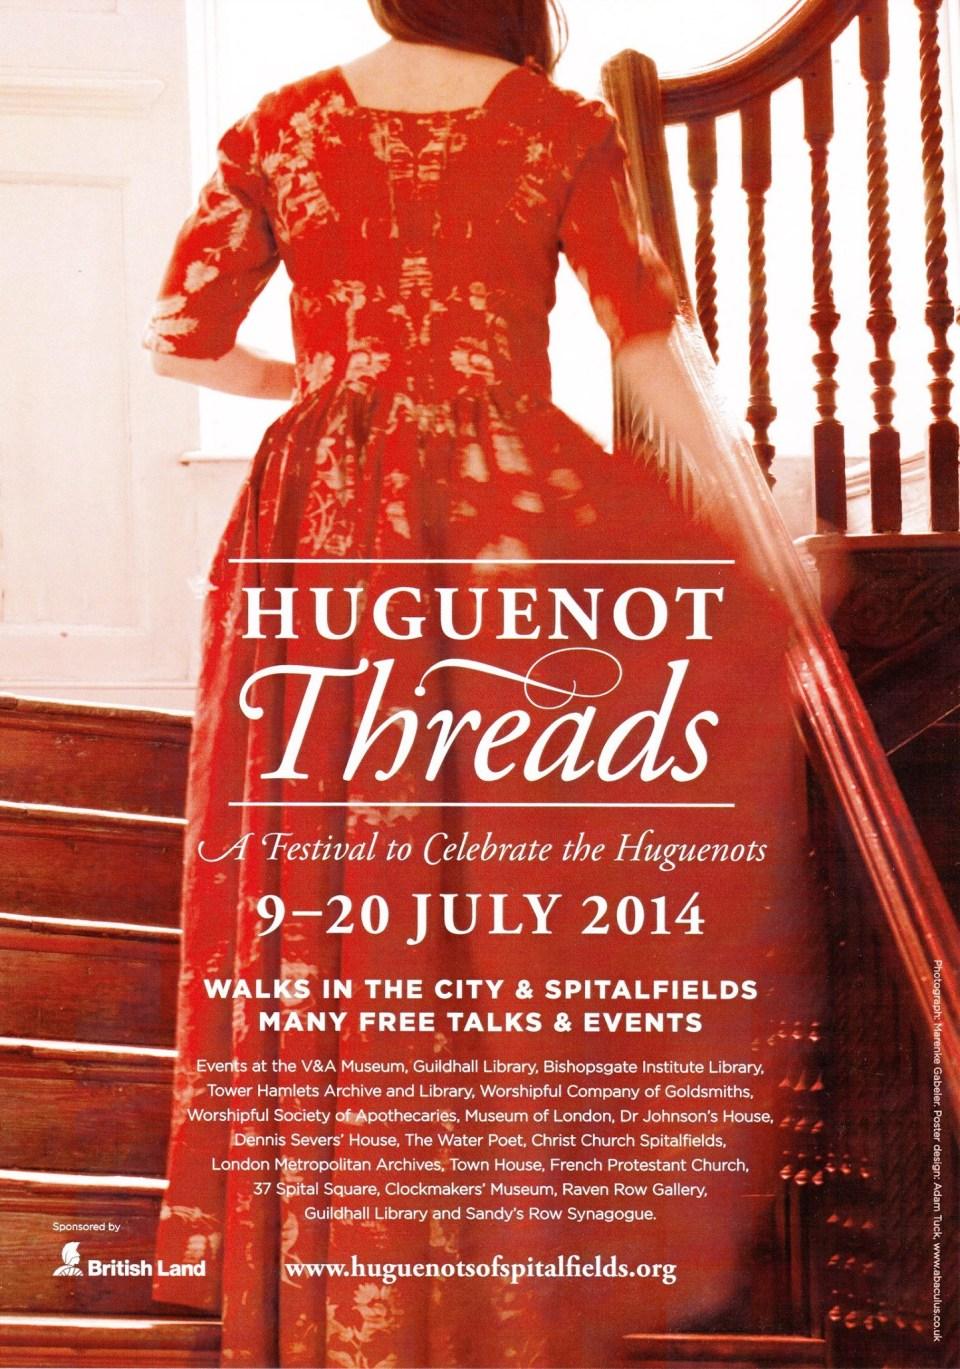 Poster for the Huguenot Threads festival